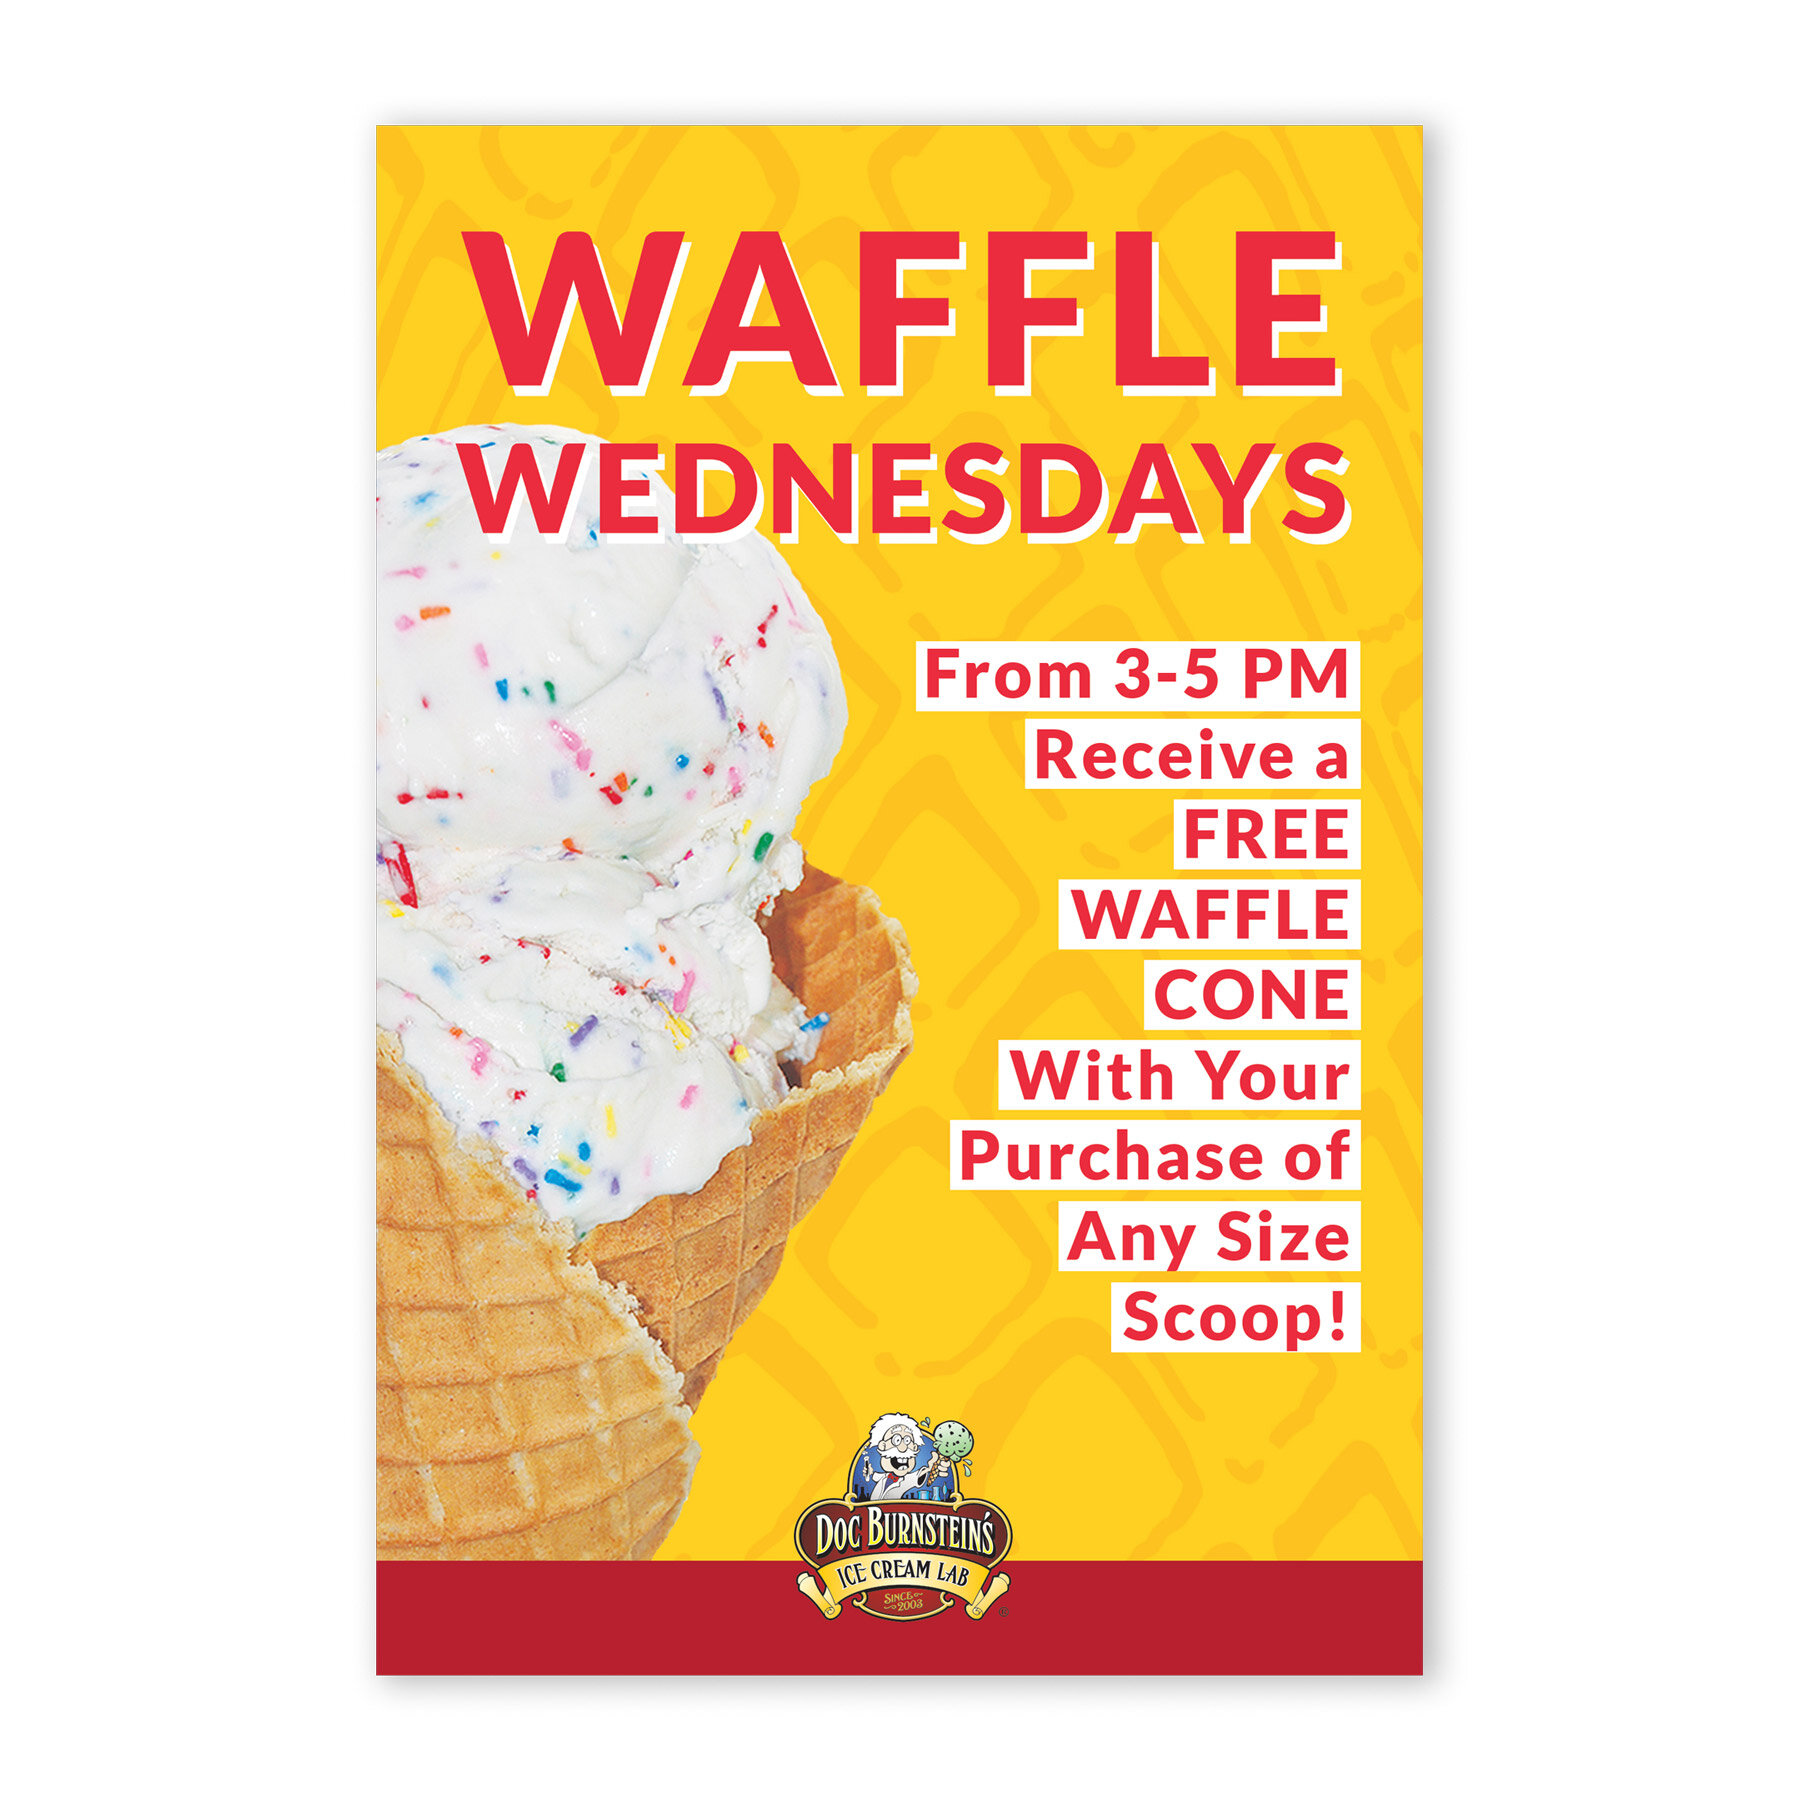 CulpritMedia-Group-Doc-Burnsteins-Waffle-Wednesday-Poster-Design.jpg